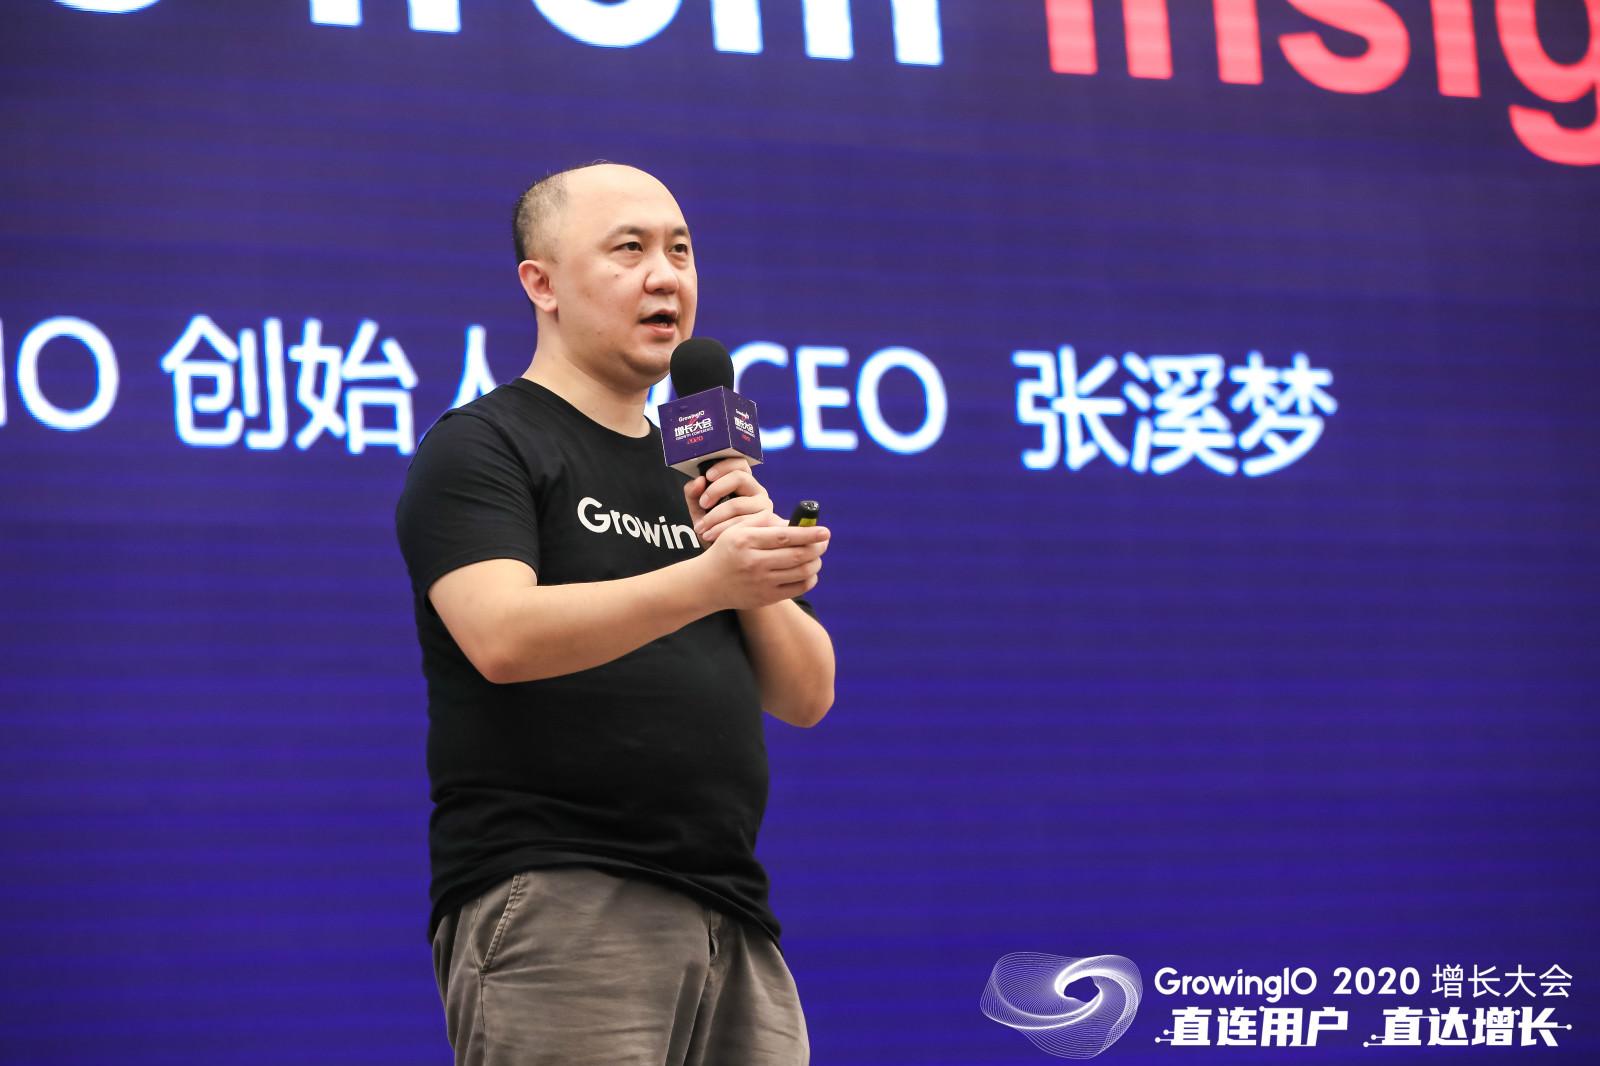 【ToB快讯】GrowingIO 发布增长平台,全栈加速传统大中企业数字化转型